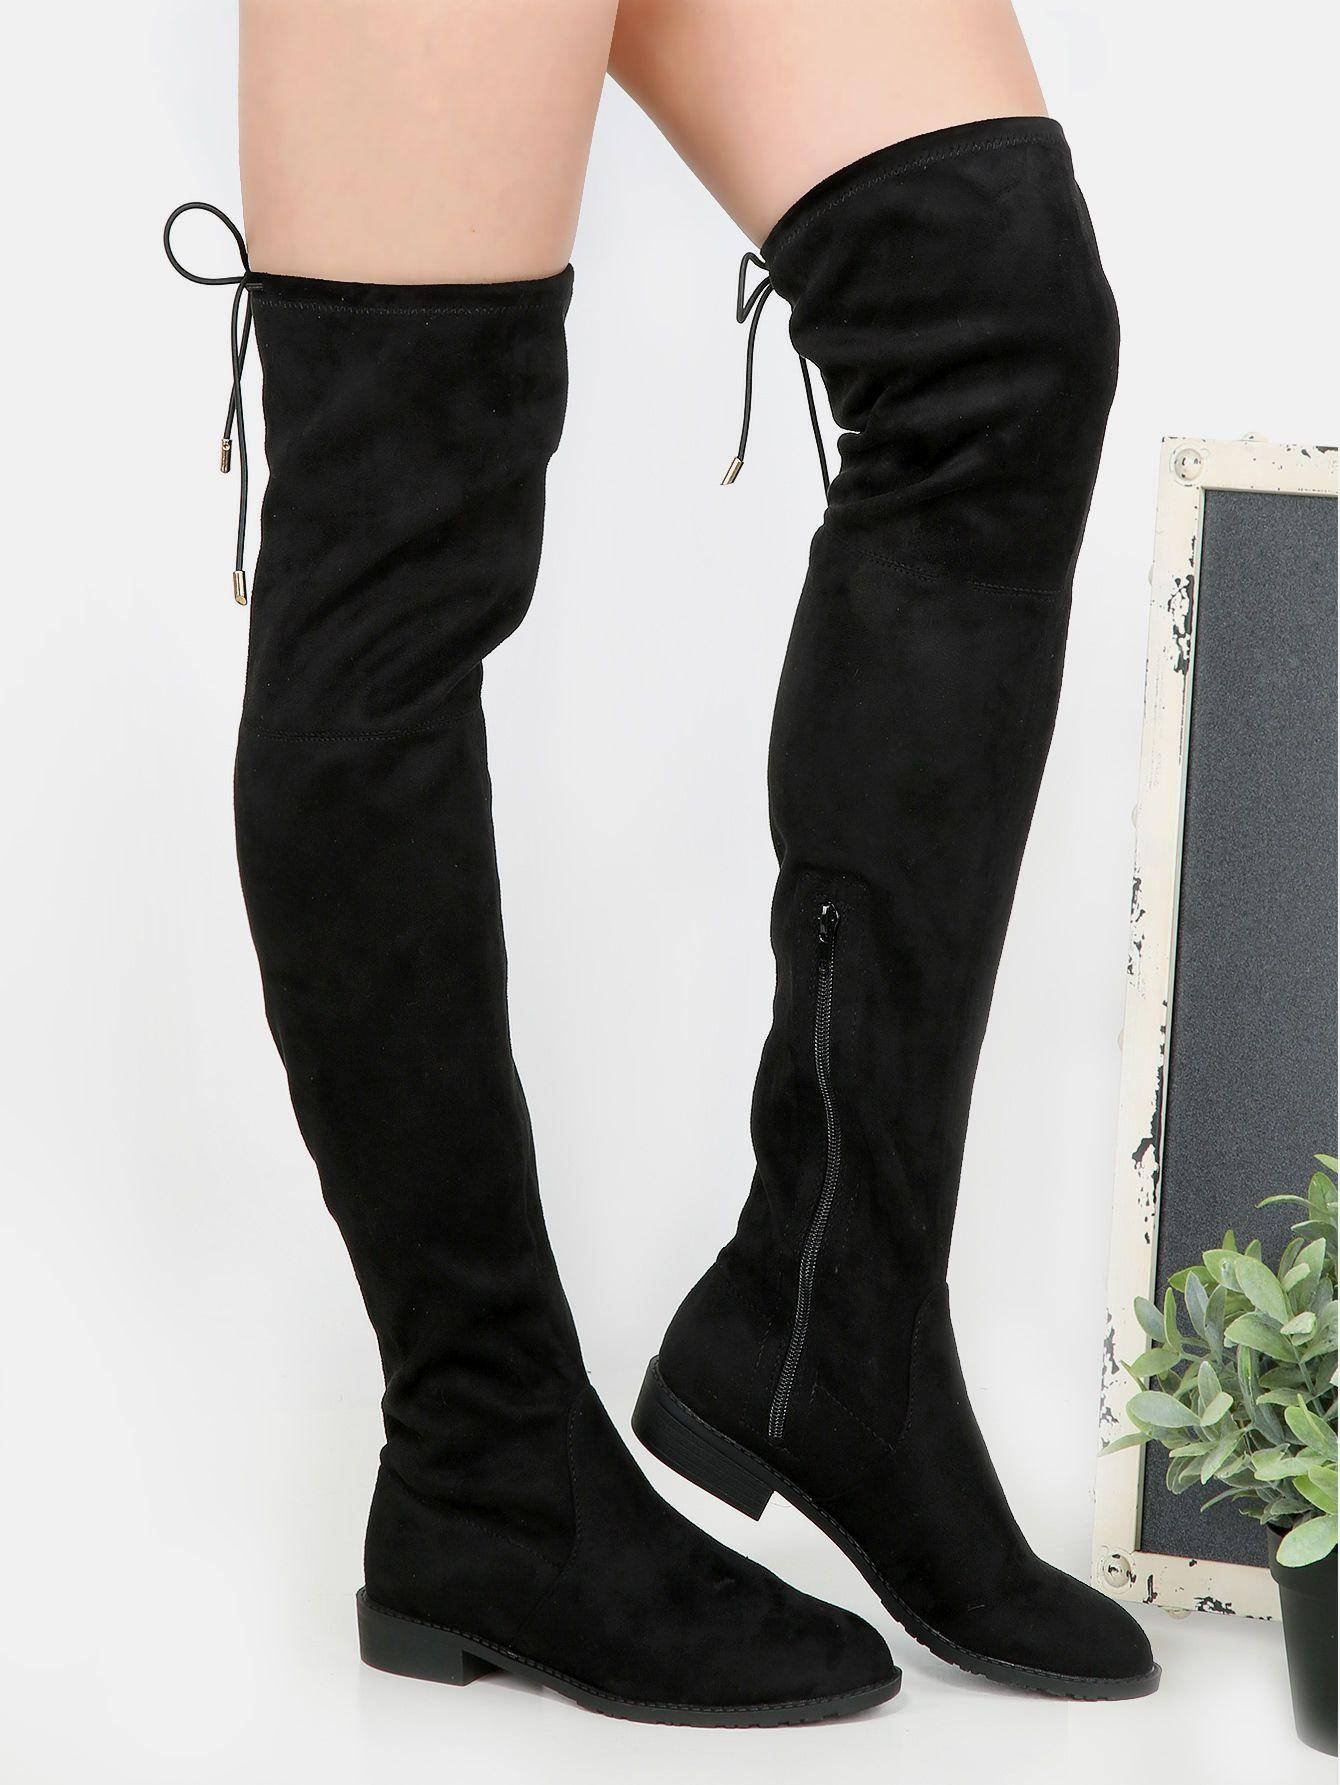 Flat Heel Thigh High Boots BLACK -SheIn